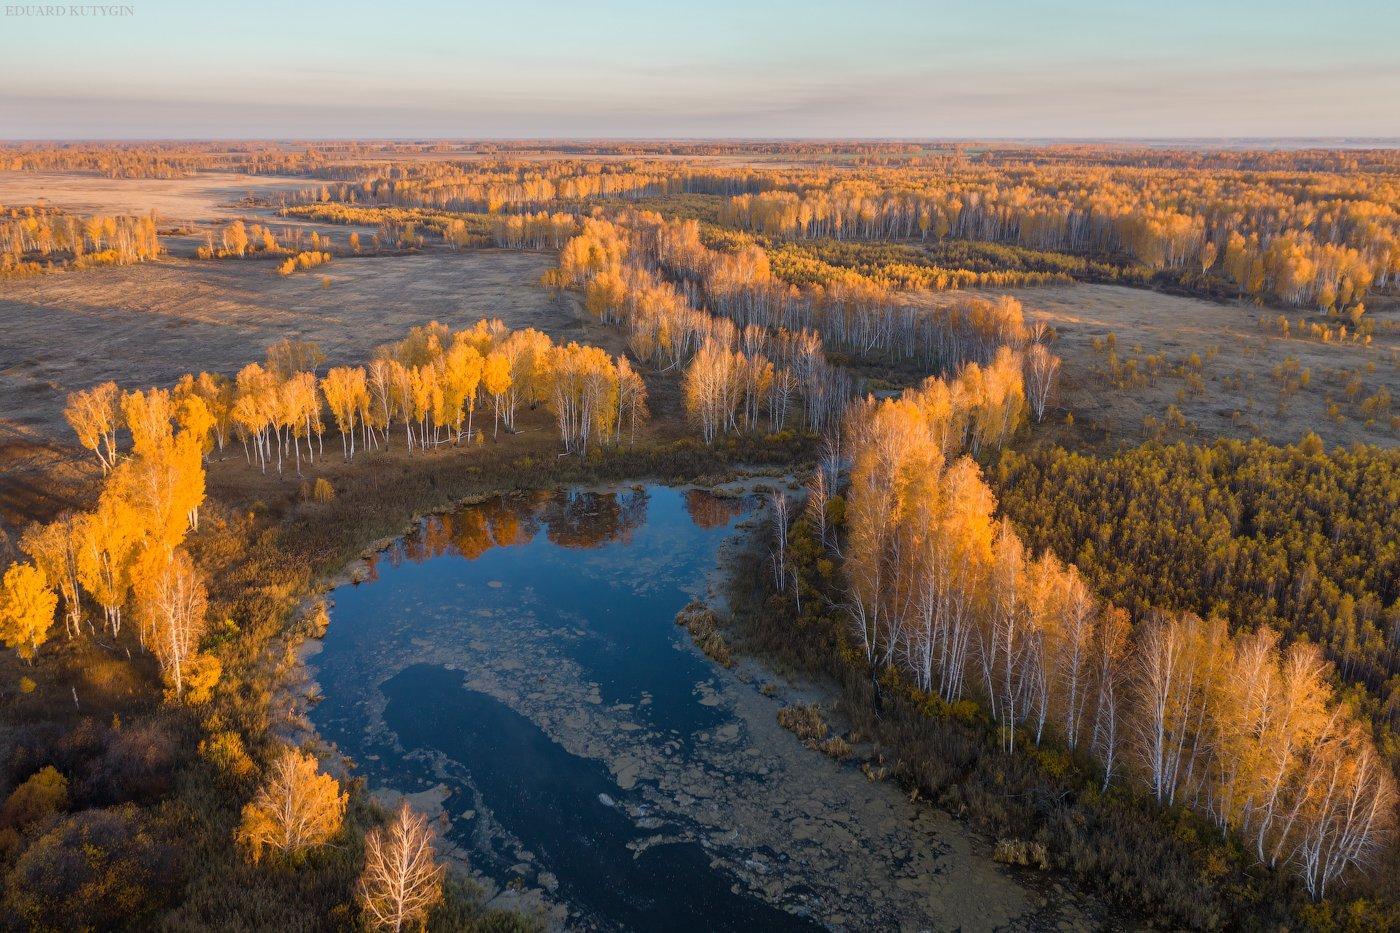 Курганская Шадринск, Кутыгин Эдуард